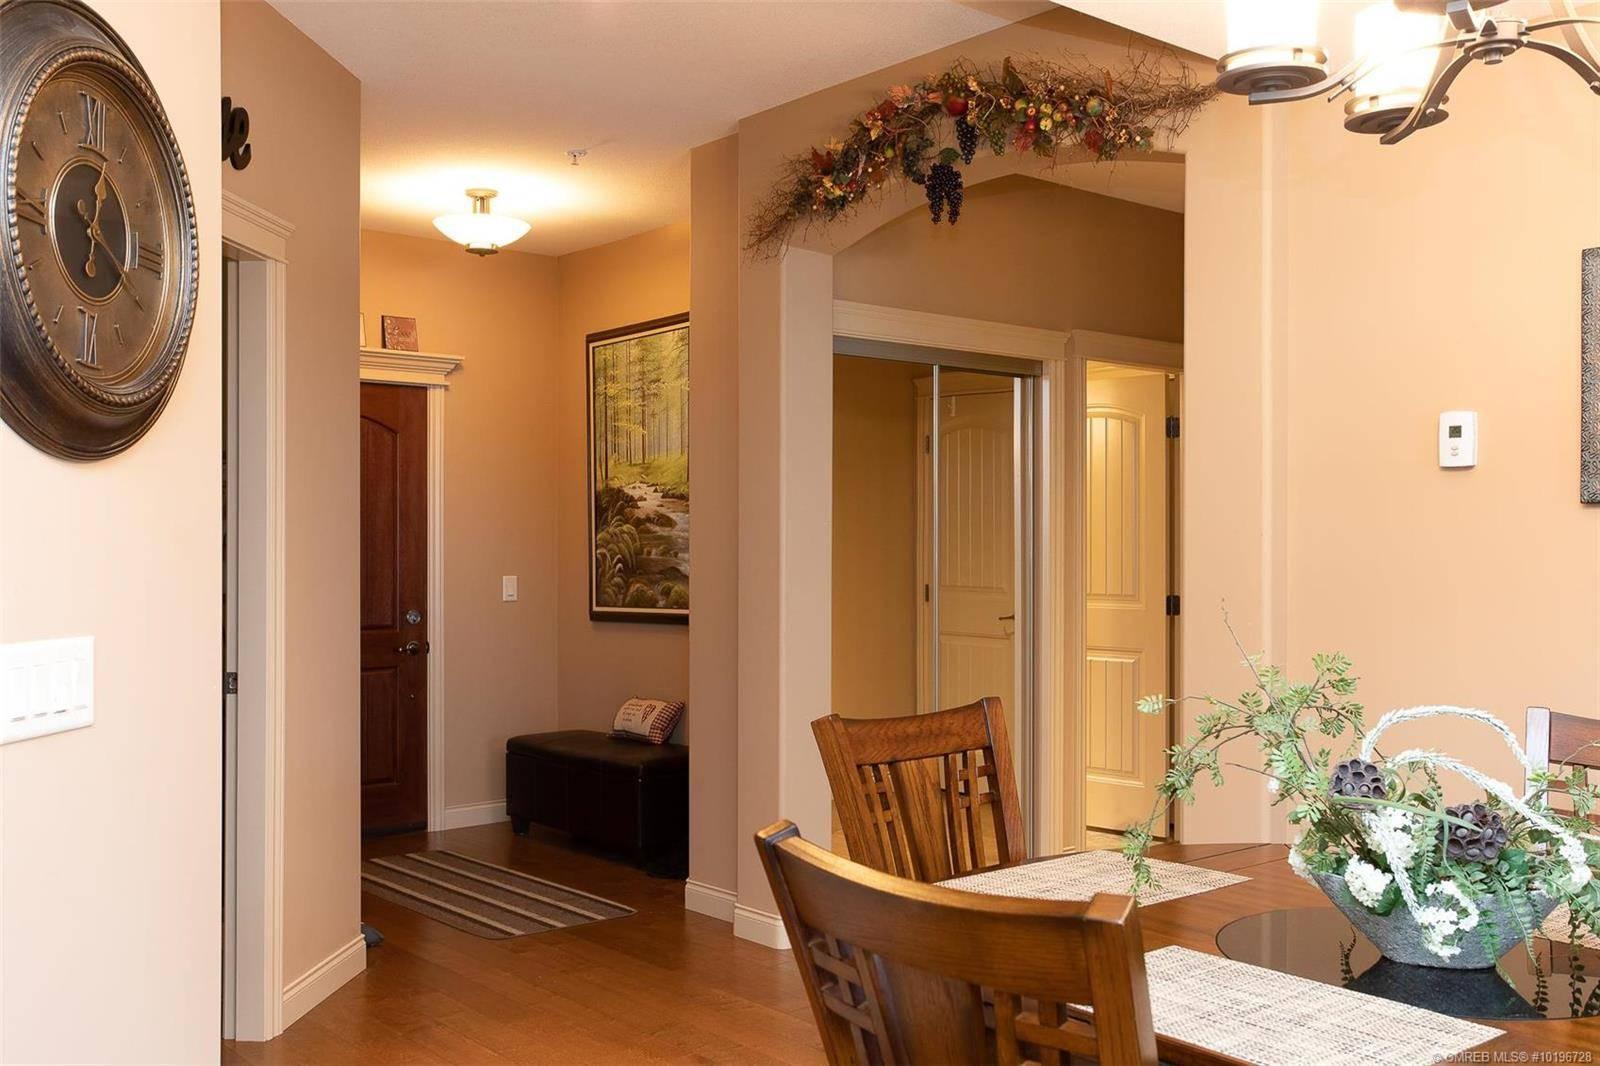 Condo for sale at 2750 Auburn Rd Unit 103 West Kelowna British Columbia - MLS: 10196728